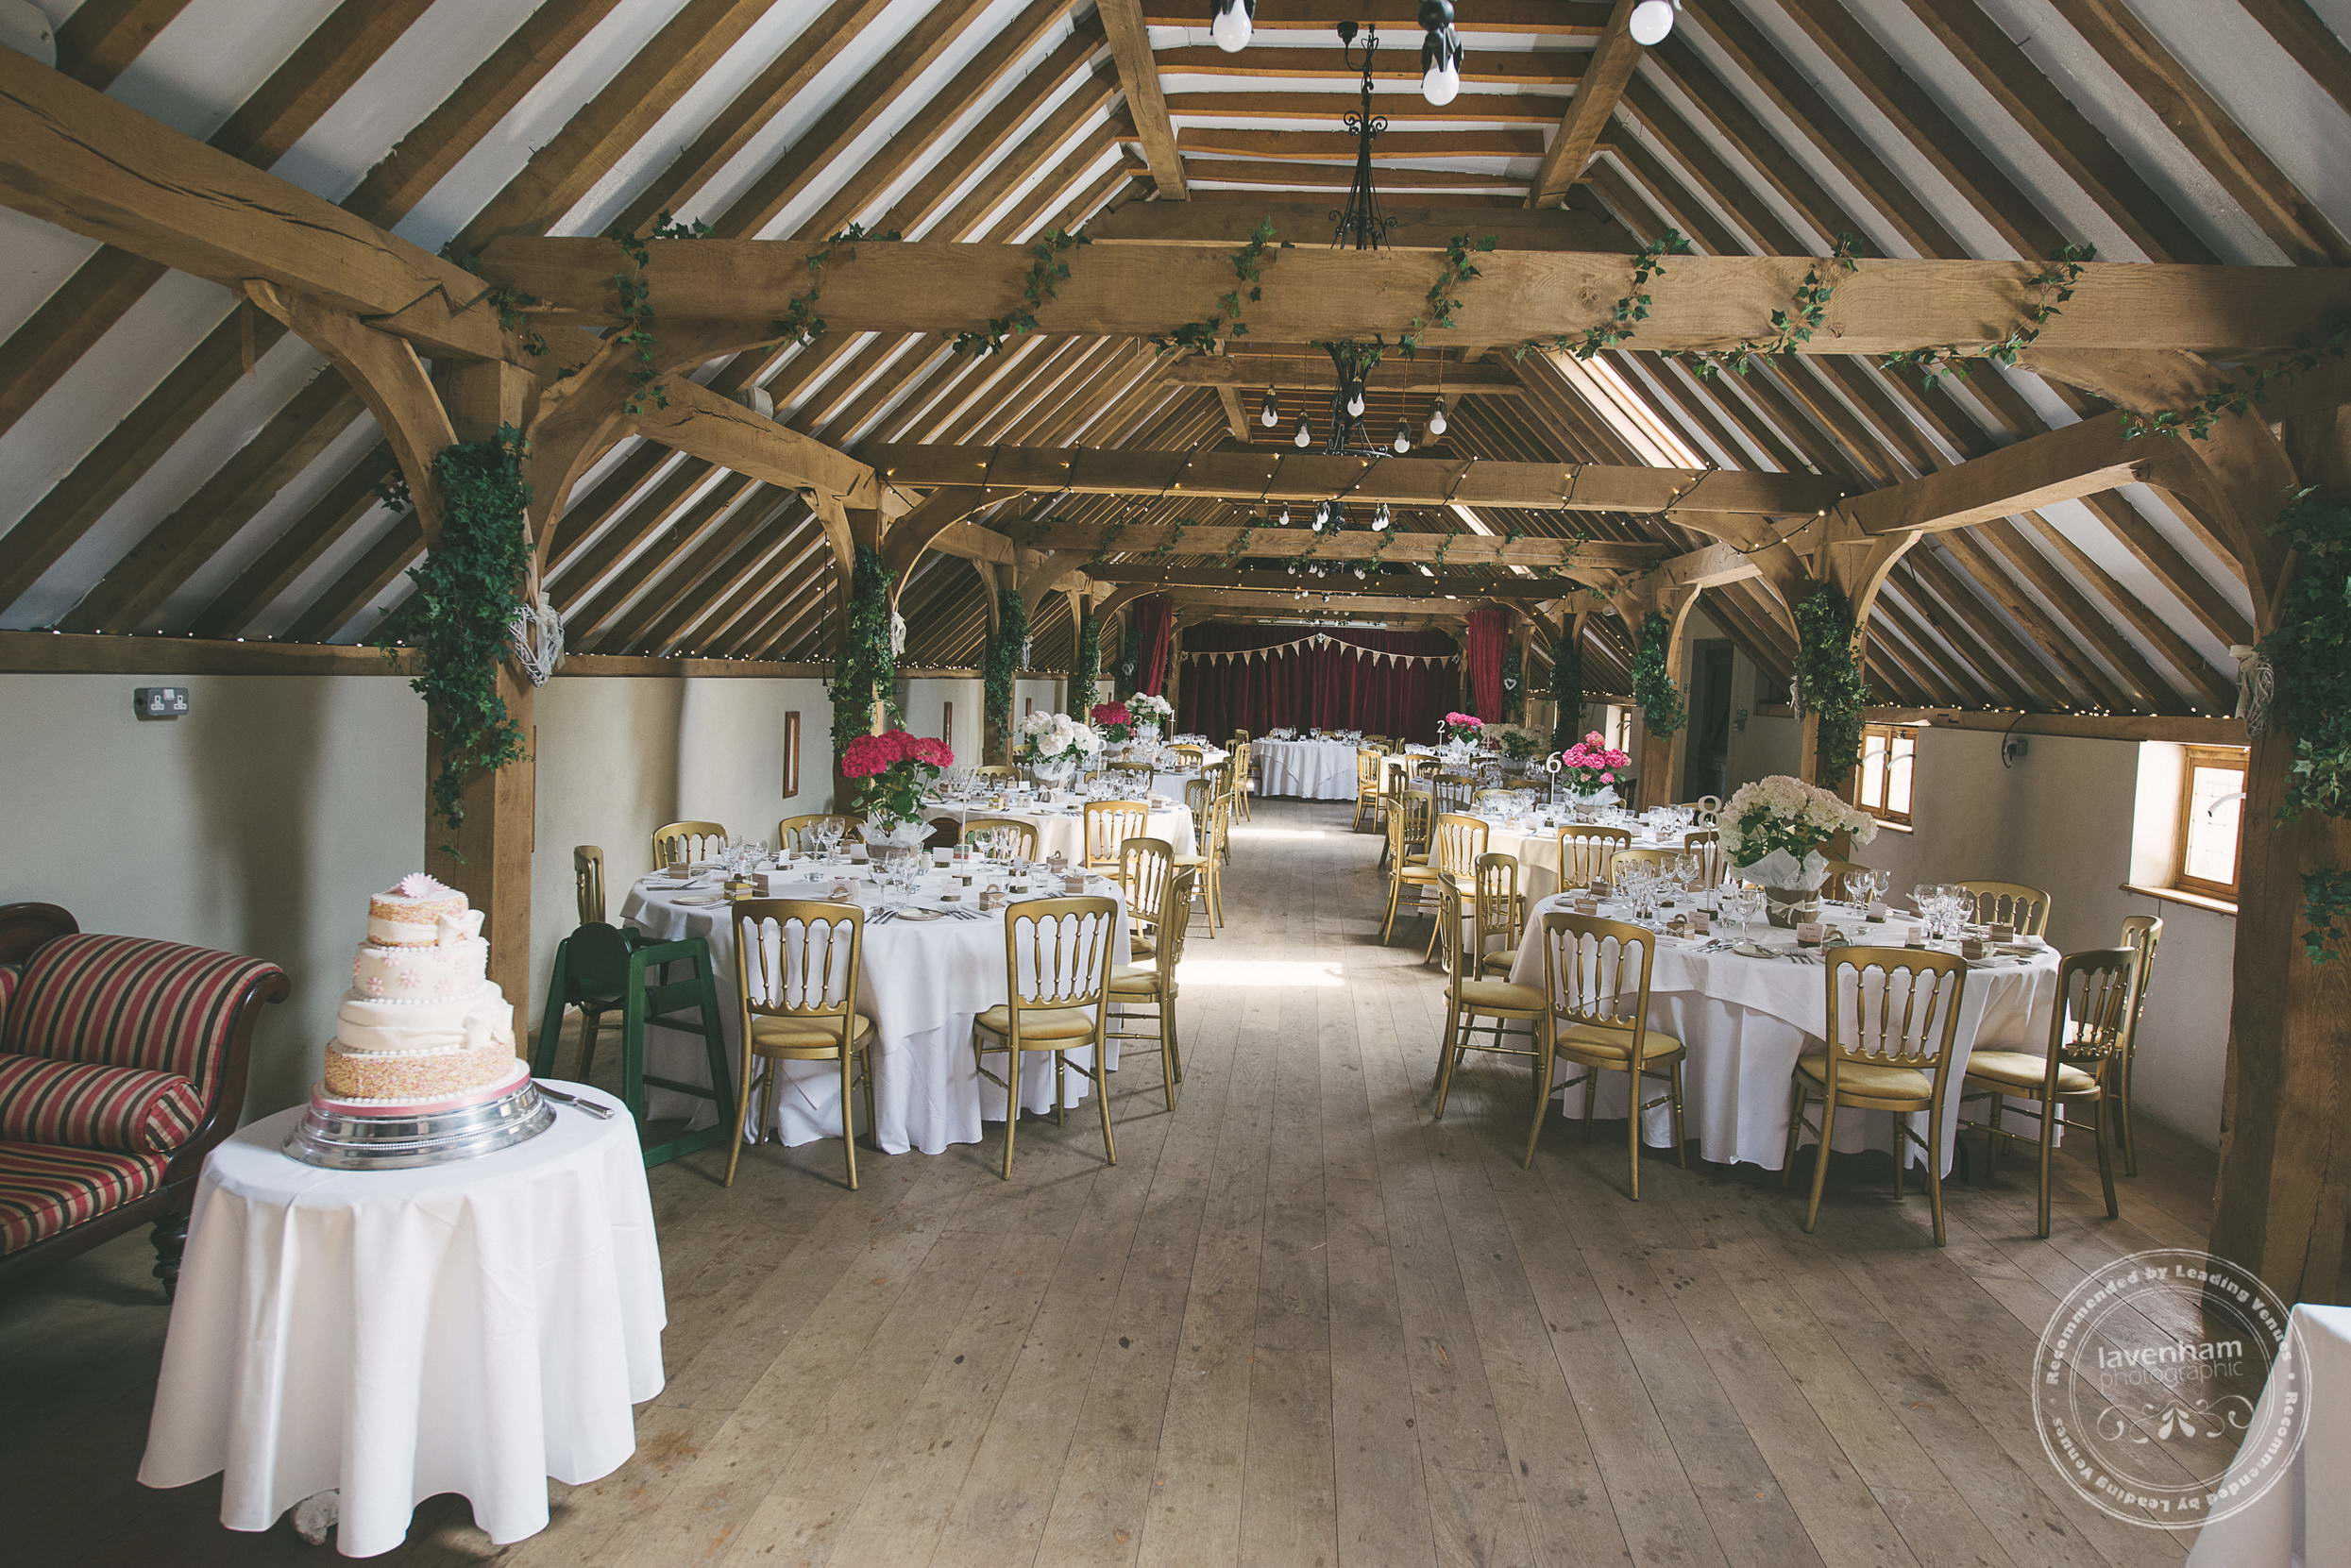 180715-kentwell-hall-wedding-photographer-042